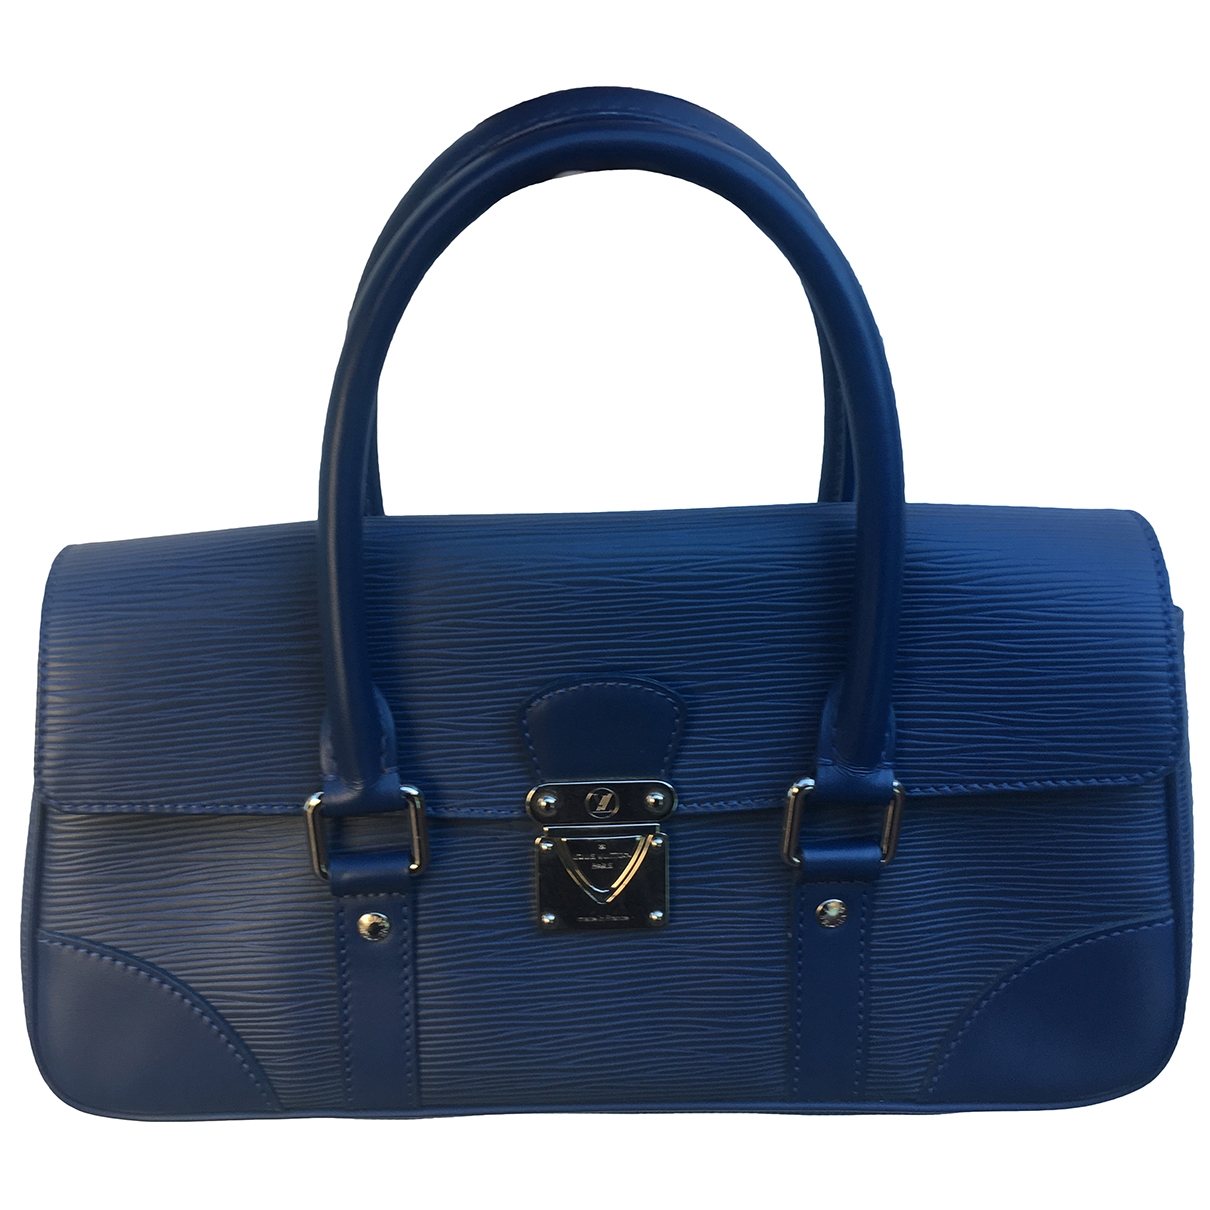 Louis Vuitton - Sac a main Segur pour femme en cuir - bleu